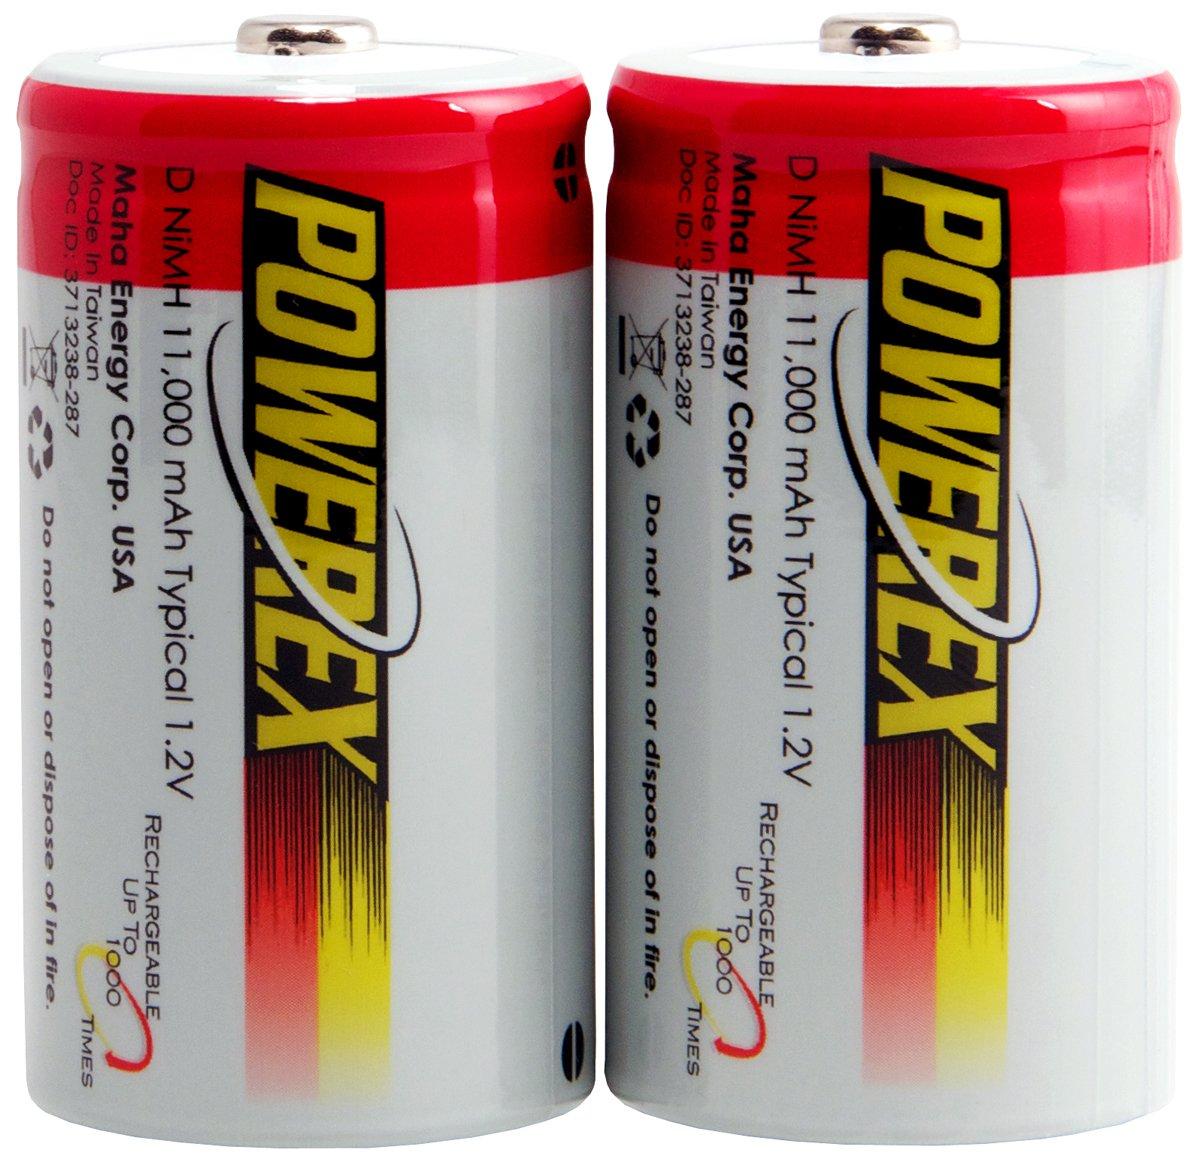 Amazon.com: Powerex mh-2d110 Powerex D 11000 mAh baterías ...